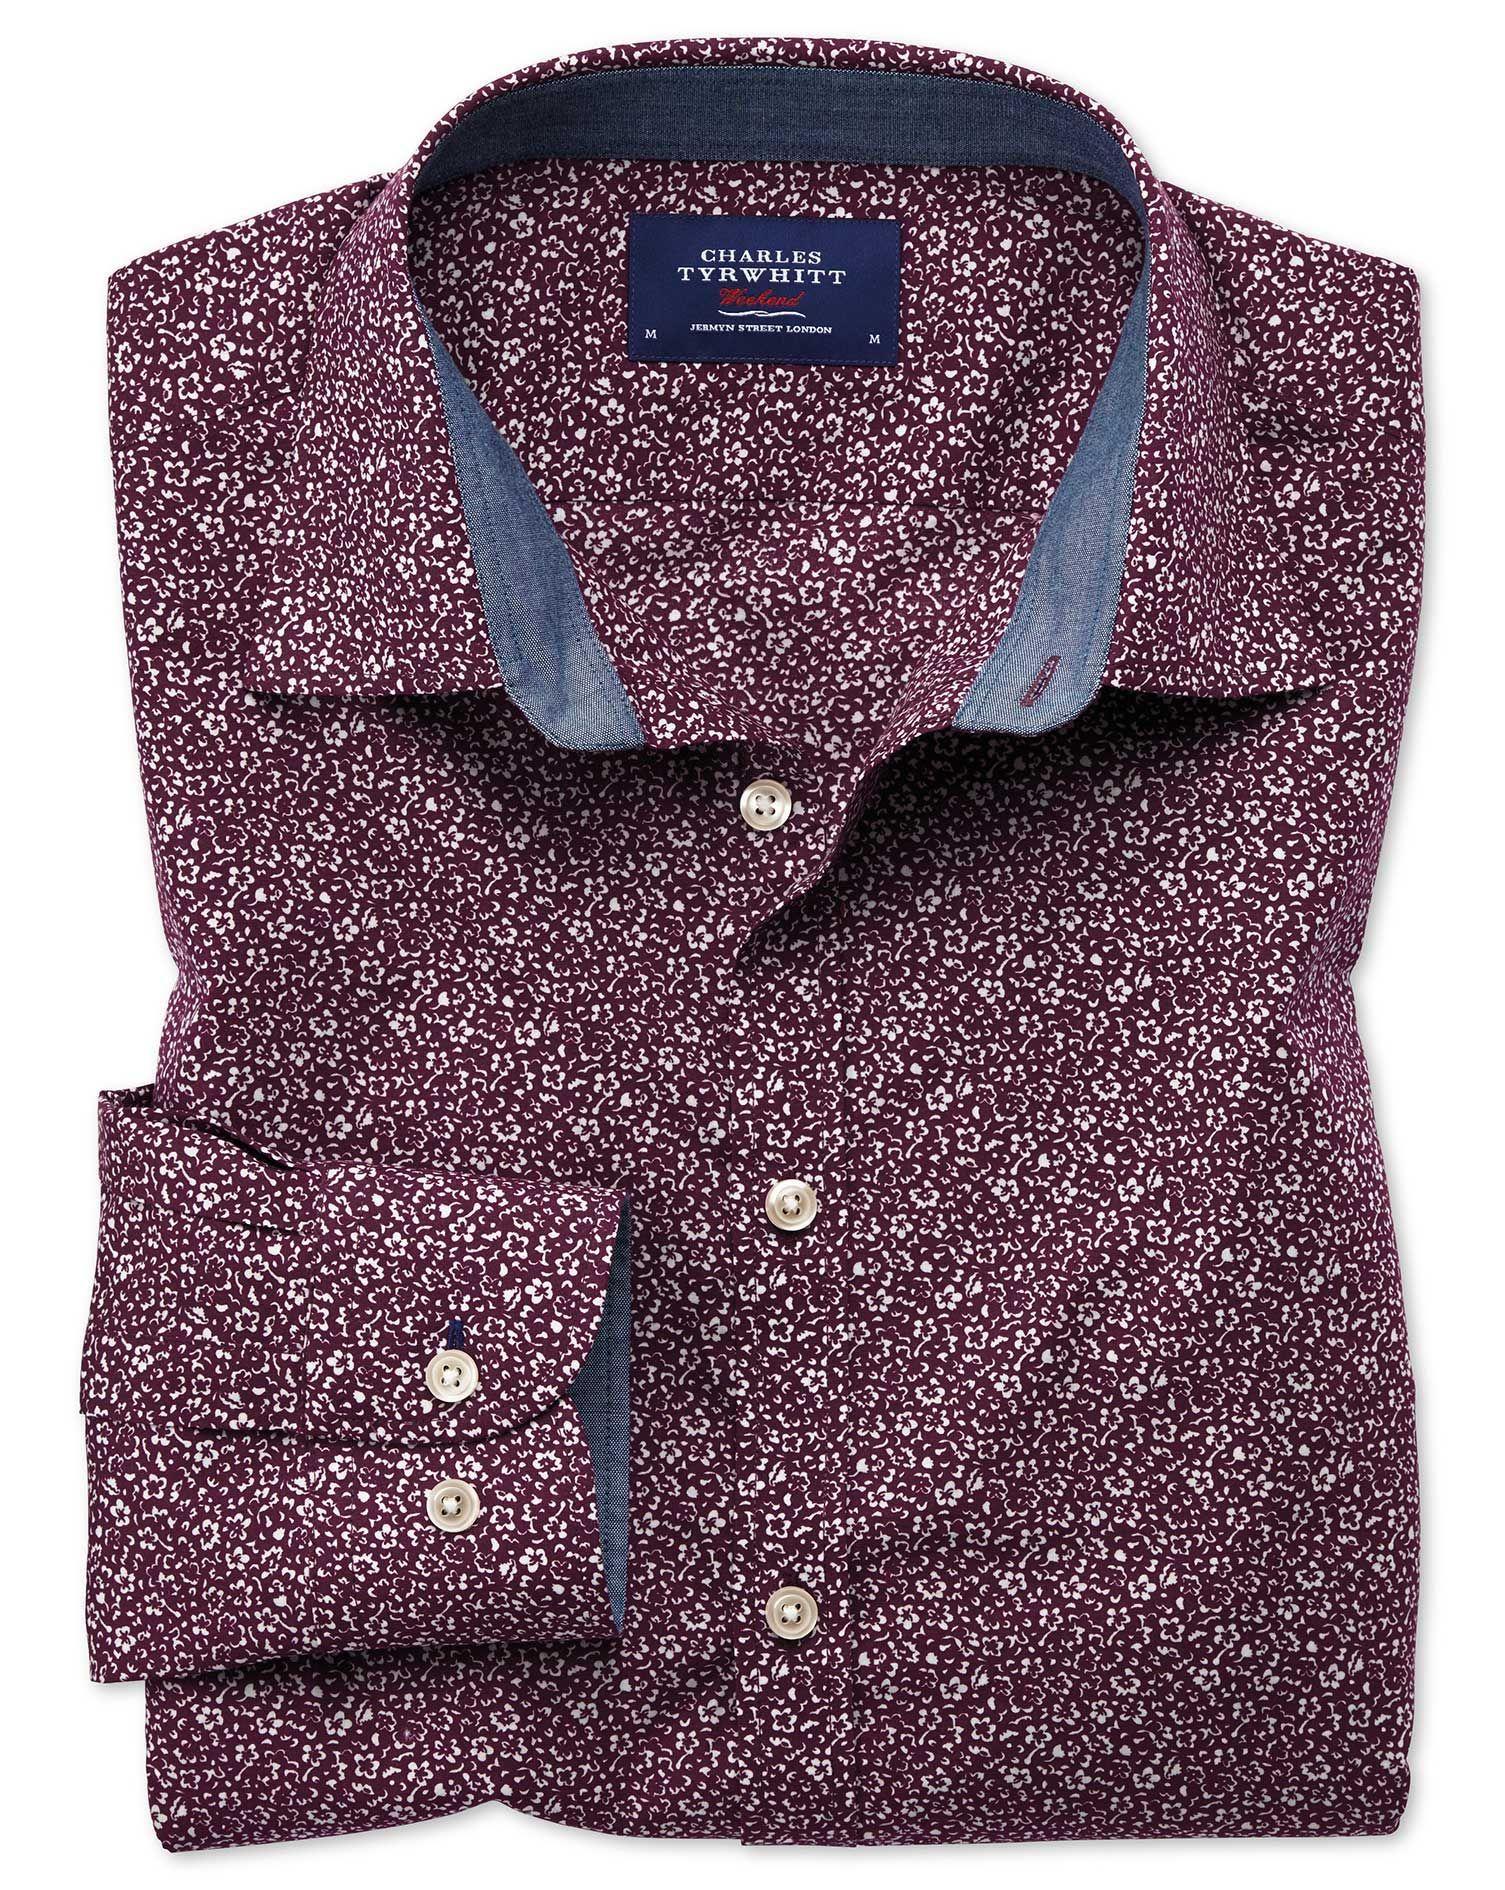 e9a543dadb03 Extra slim fit purple floral print shirt